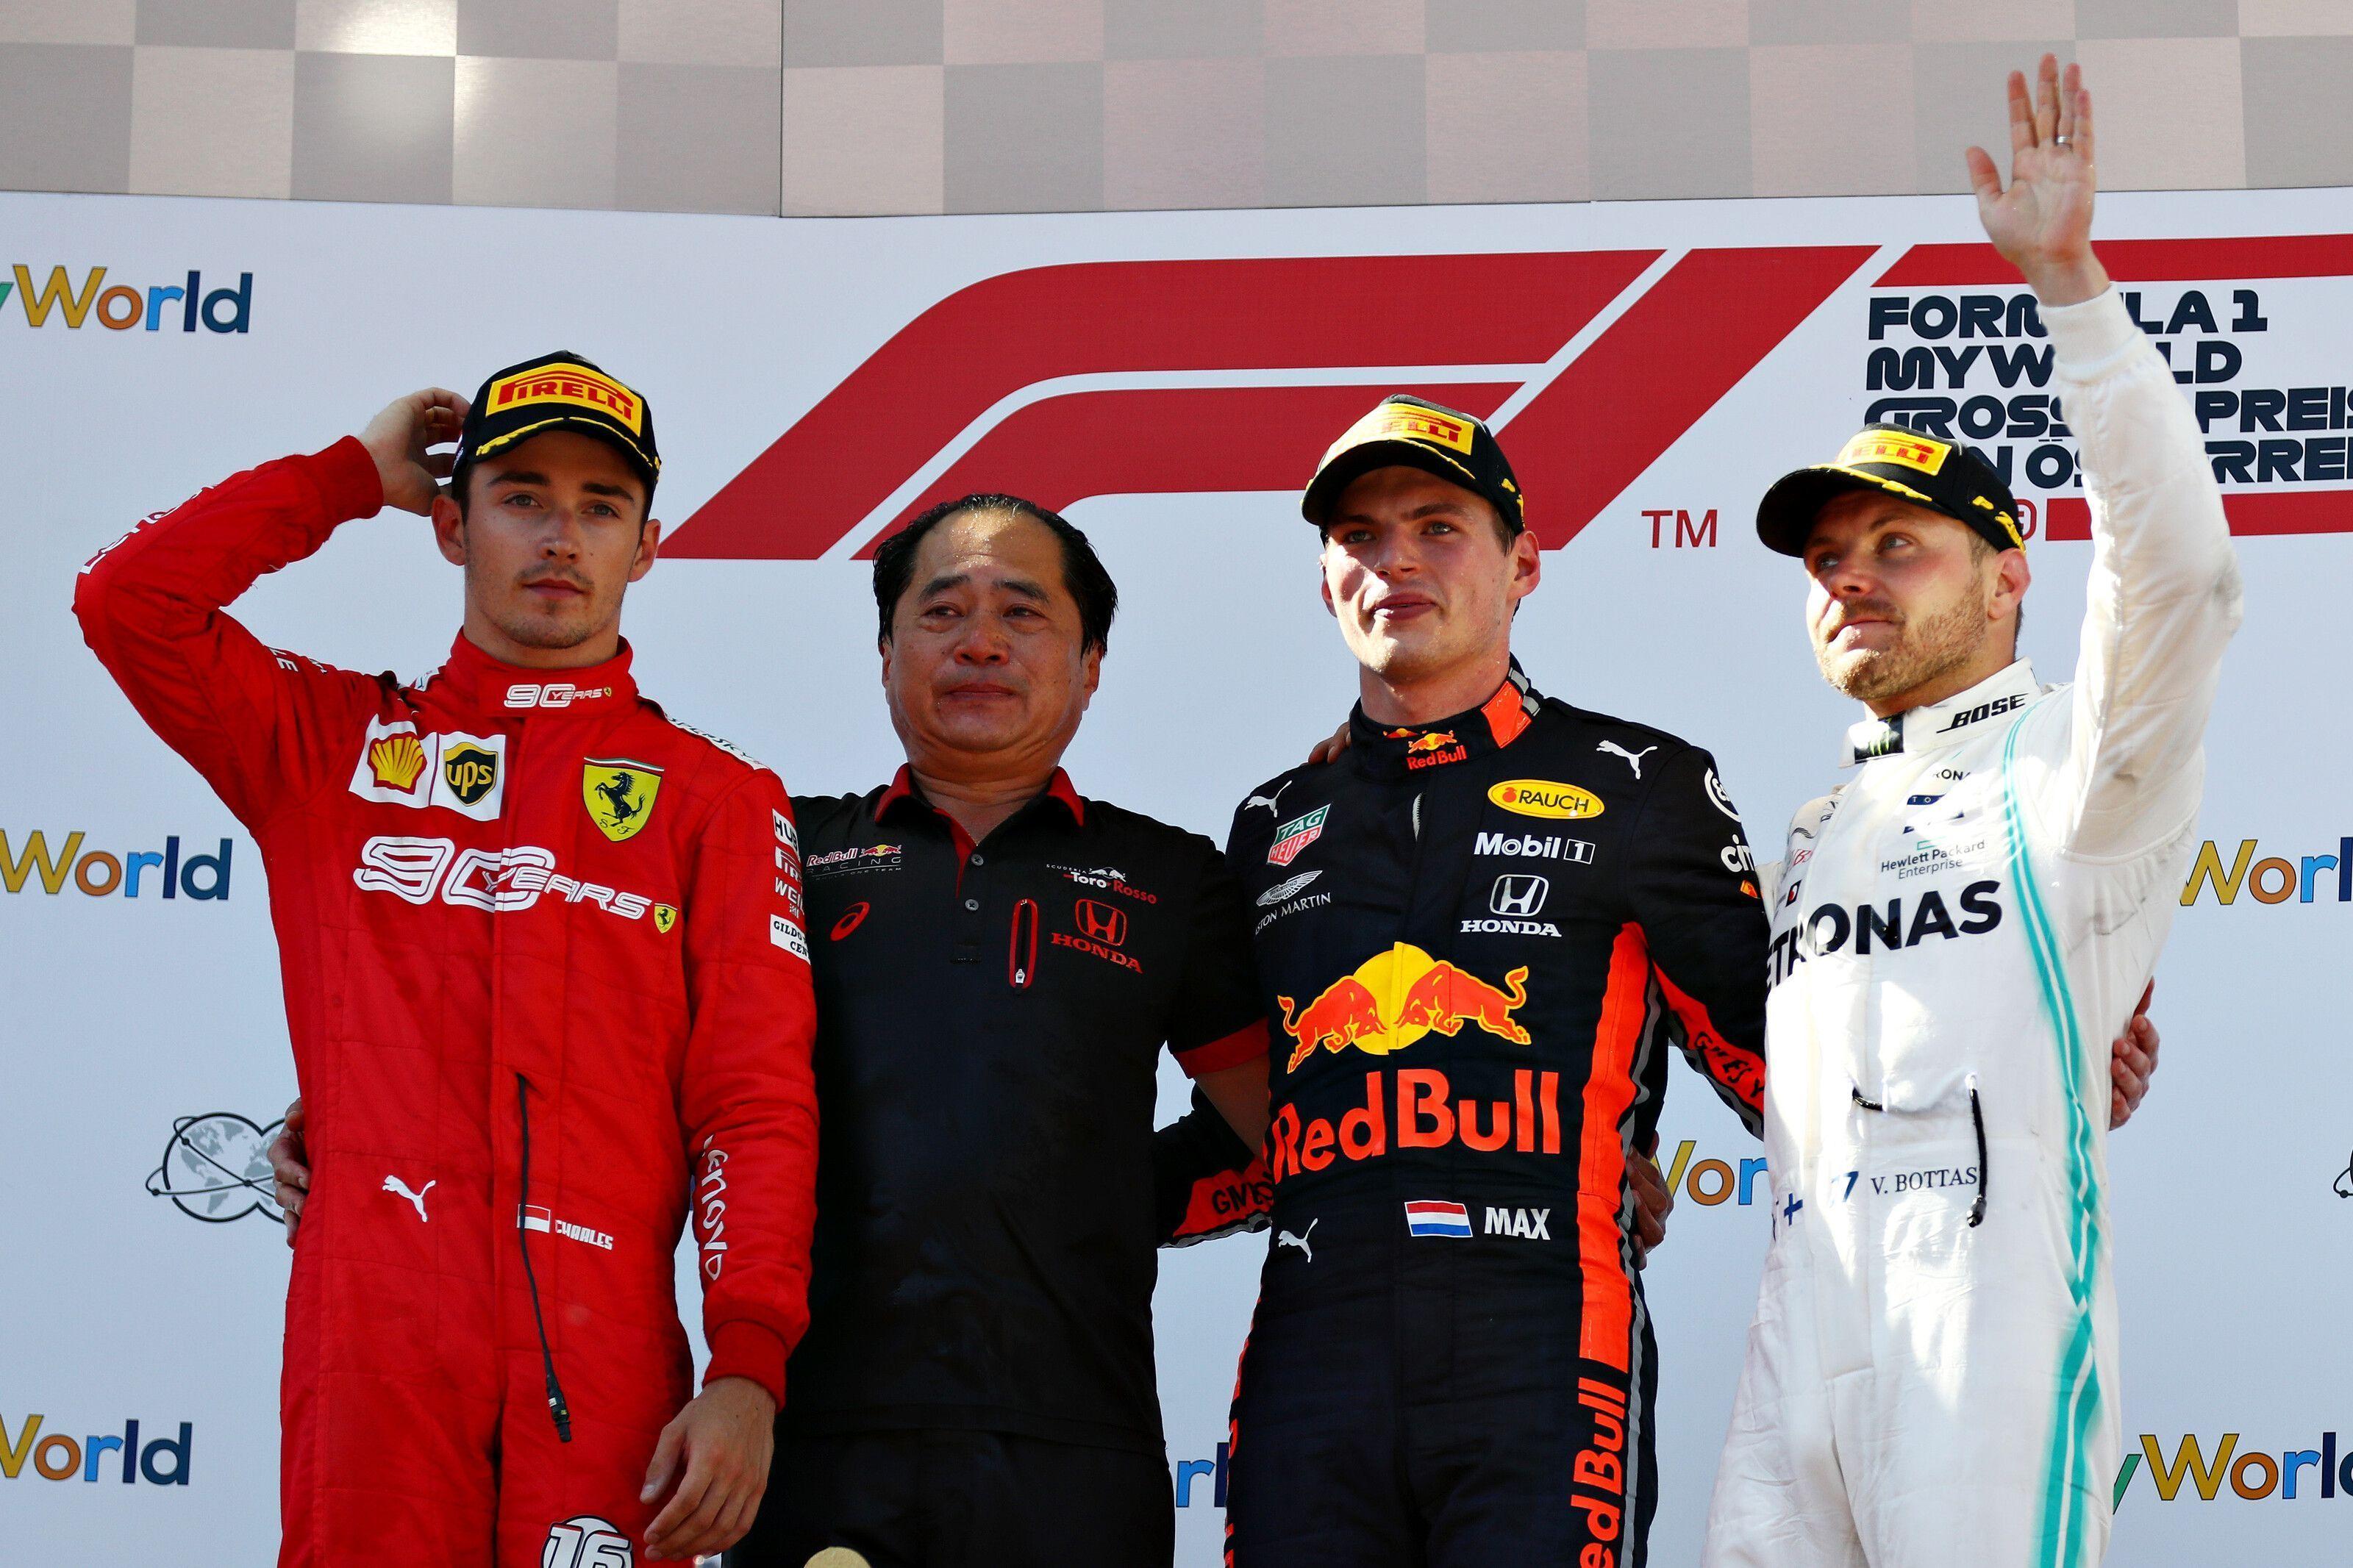 F1, Austrian GP, Max Verstappen